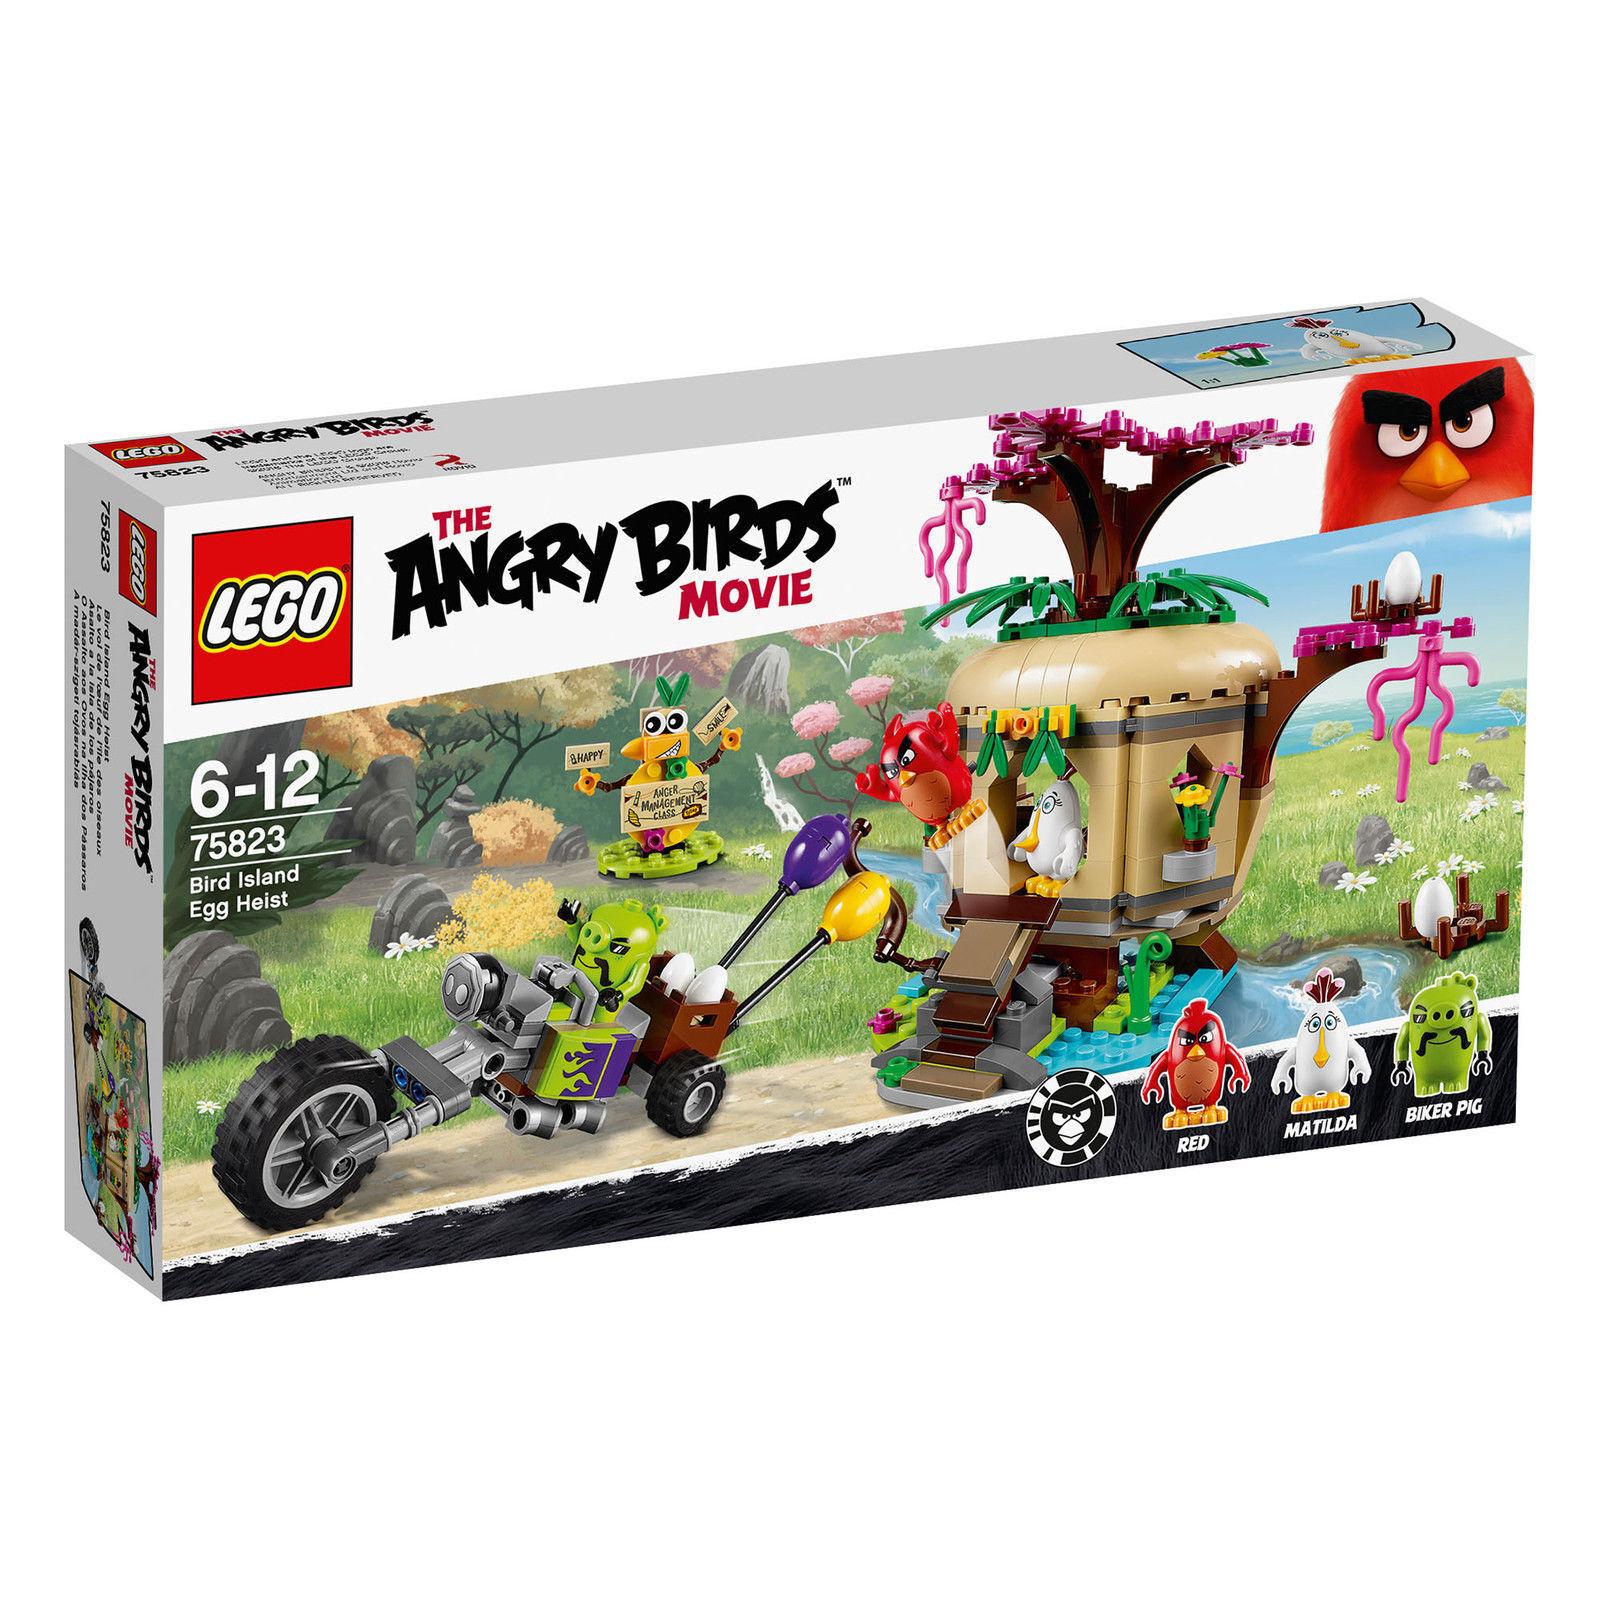 New  LEGO Bird Island Egg Heist The Angry Birds Movie Age 6-12   277 Pcs